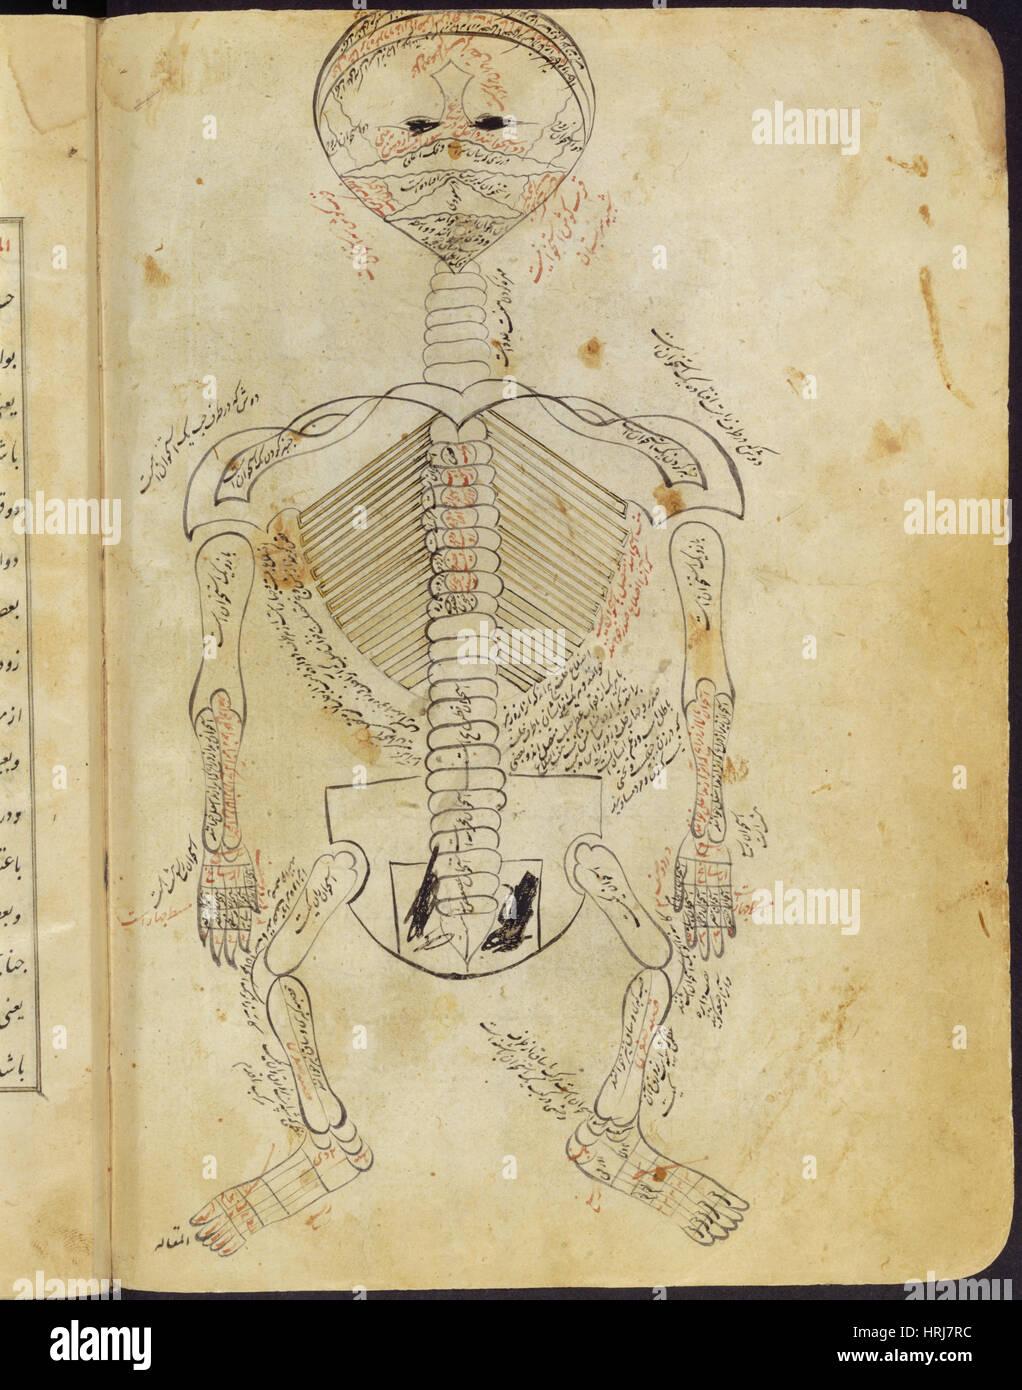 Anatomy Skeletal System Stock Photos & Anatomy Skeletal System Stock ...